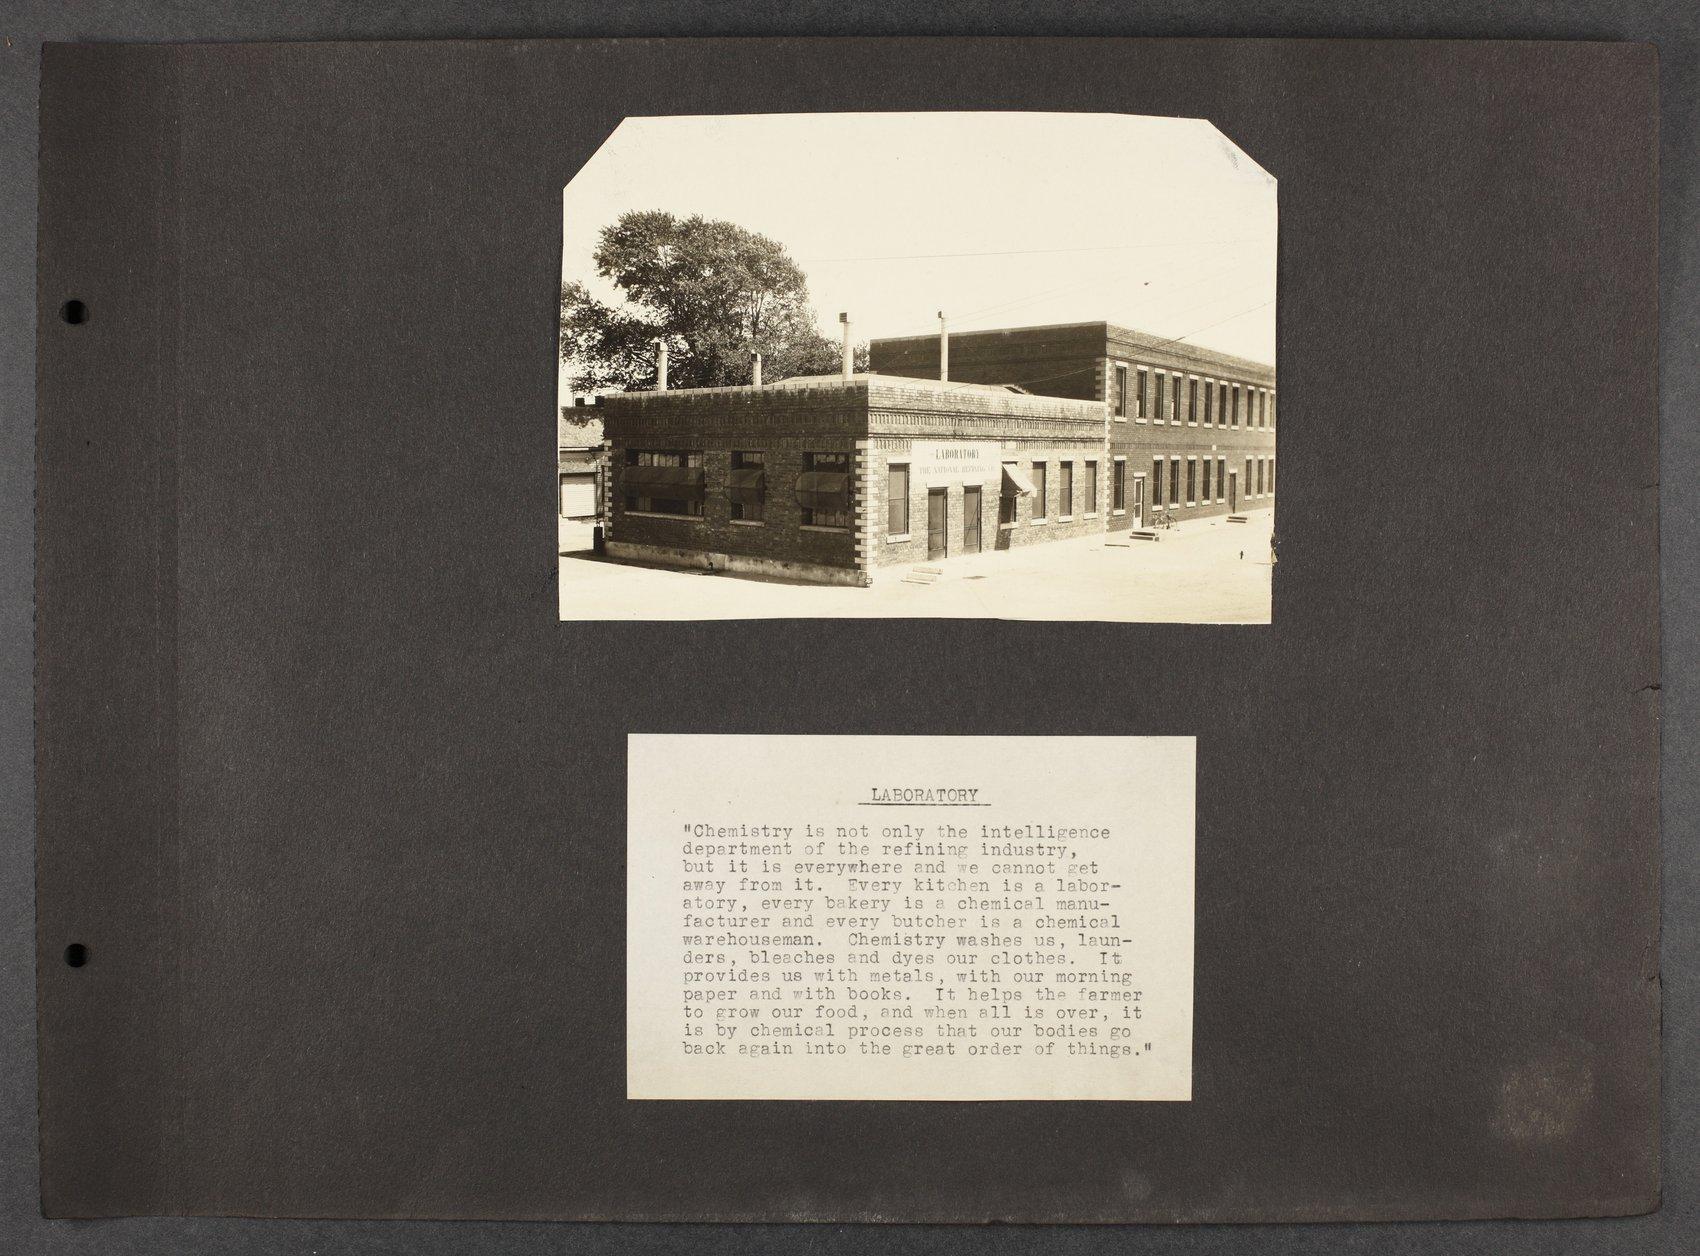 National Refining Company, Coffeyville, Kansas - 6